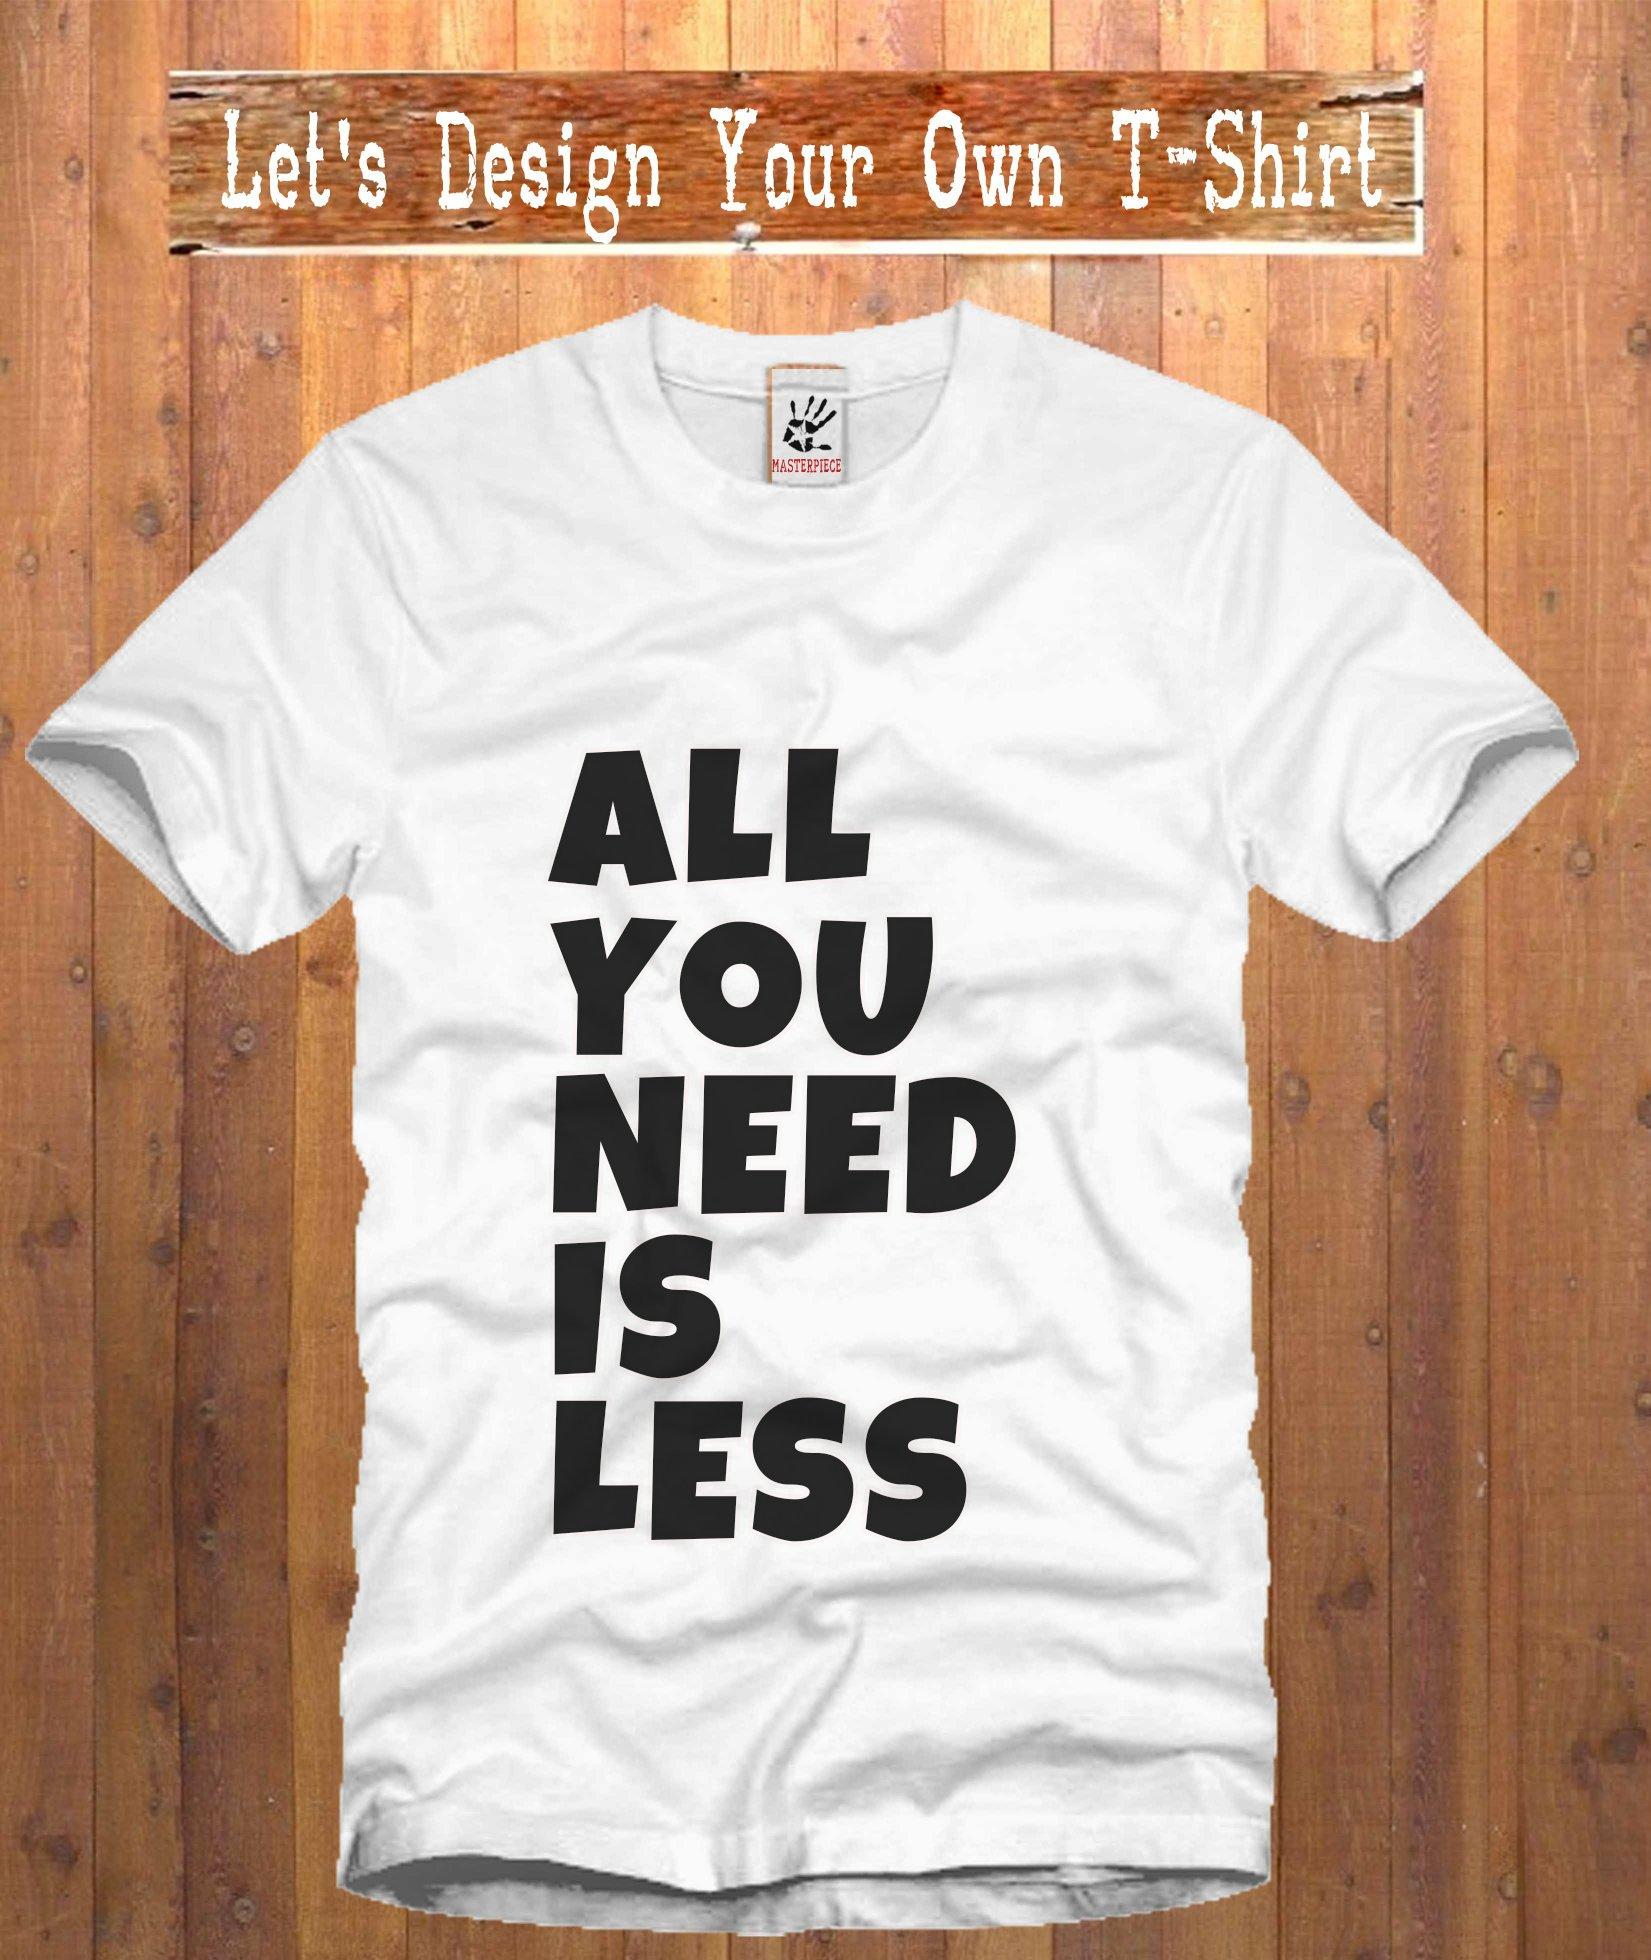 Design your own t-shirt for less -  Twitter All You Need Tersedia Size Anak Dewasa Lengan Pendek Panjang Raglan Sweater Hoodie Zipper Bebas Pilih Warna Https T Co Svvhsfunrt